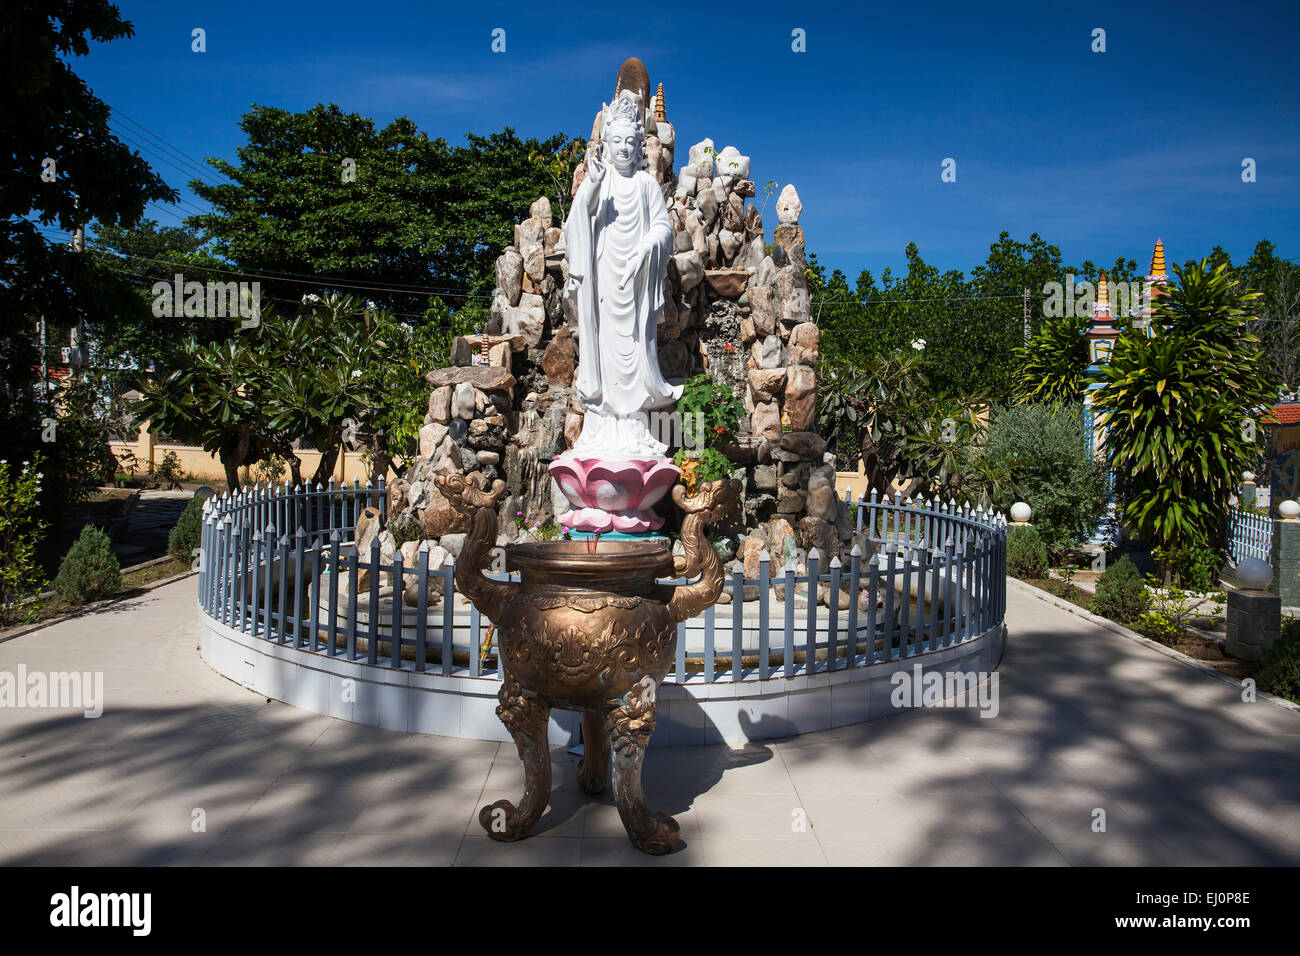 Buddha, figure, Dieu, An, Thap, Cham, Phan, Rang, Ninh, Rang, outside, pagoda, pagoda tower, place of interest, Stock Photo